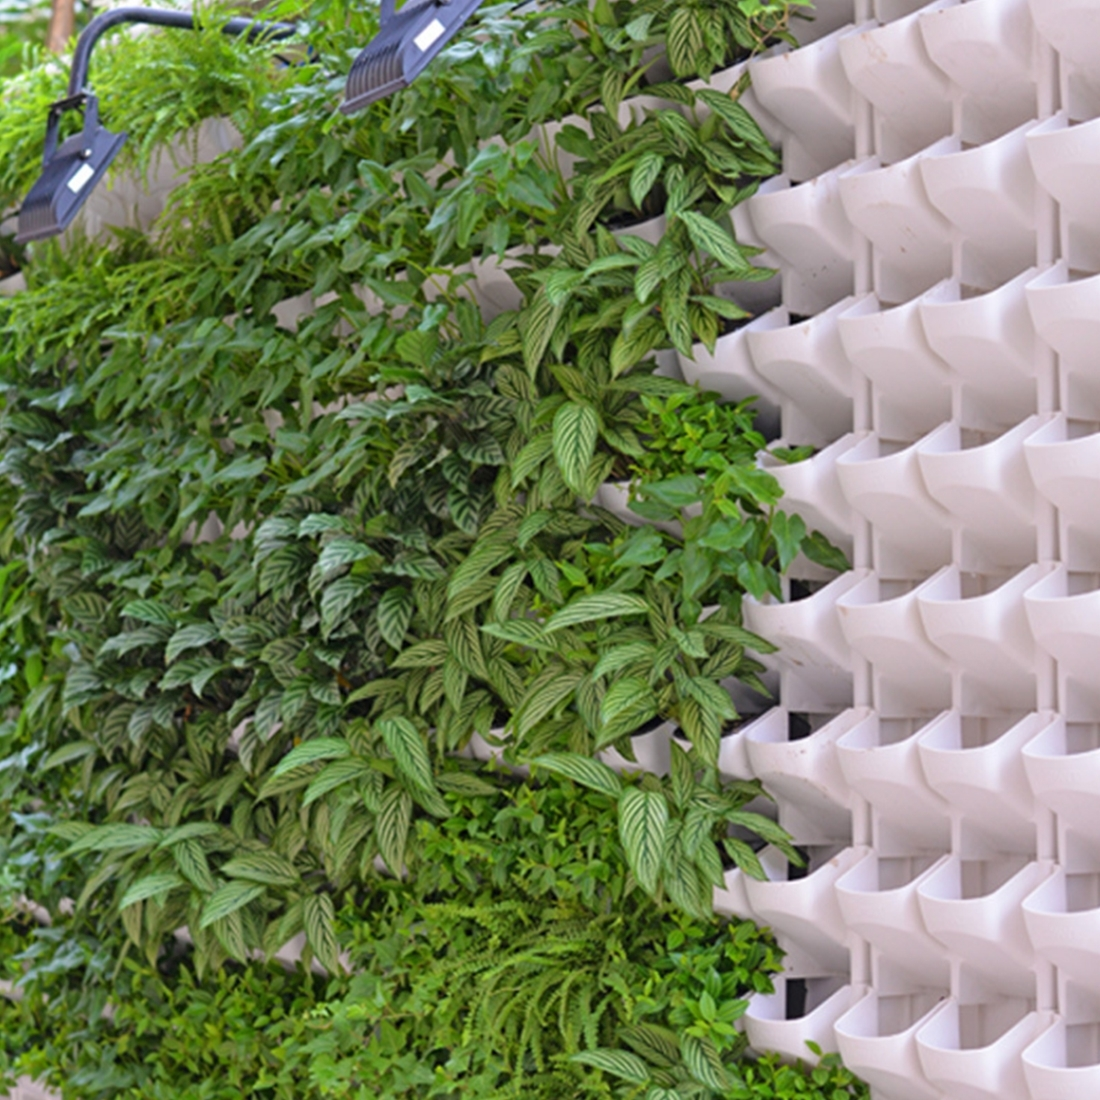 PP Planter Flower Pot Wall Hanging Garden Hanging Stackable Garden Supplies (White)